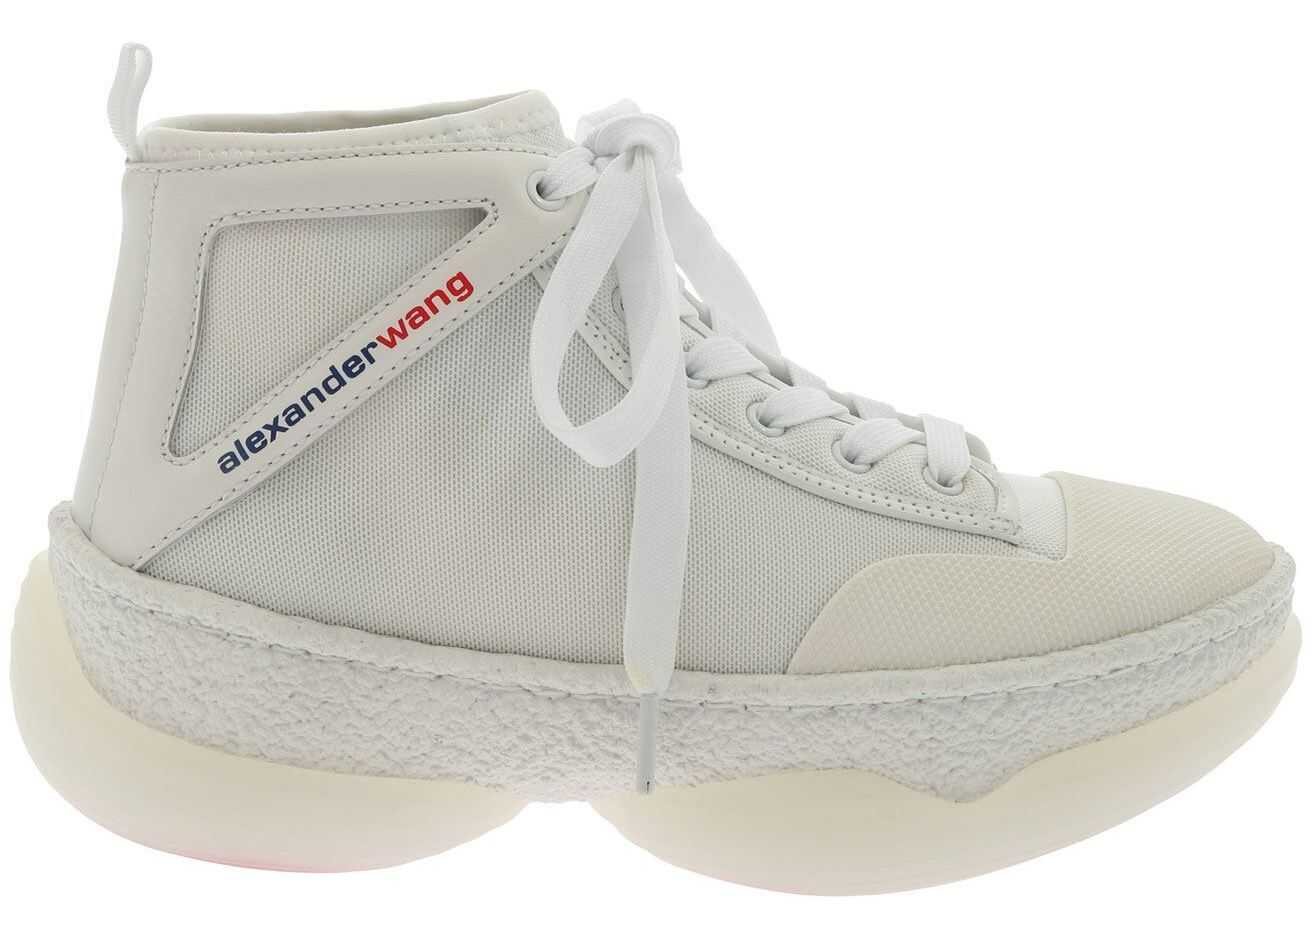 Alexander Wang Alexander Wang A1 White Sneakers White